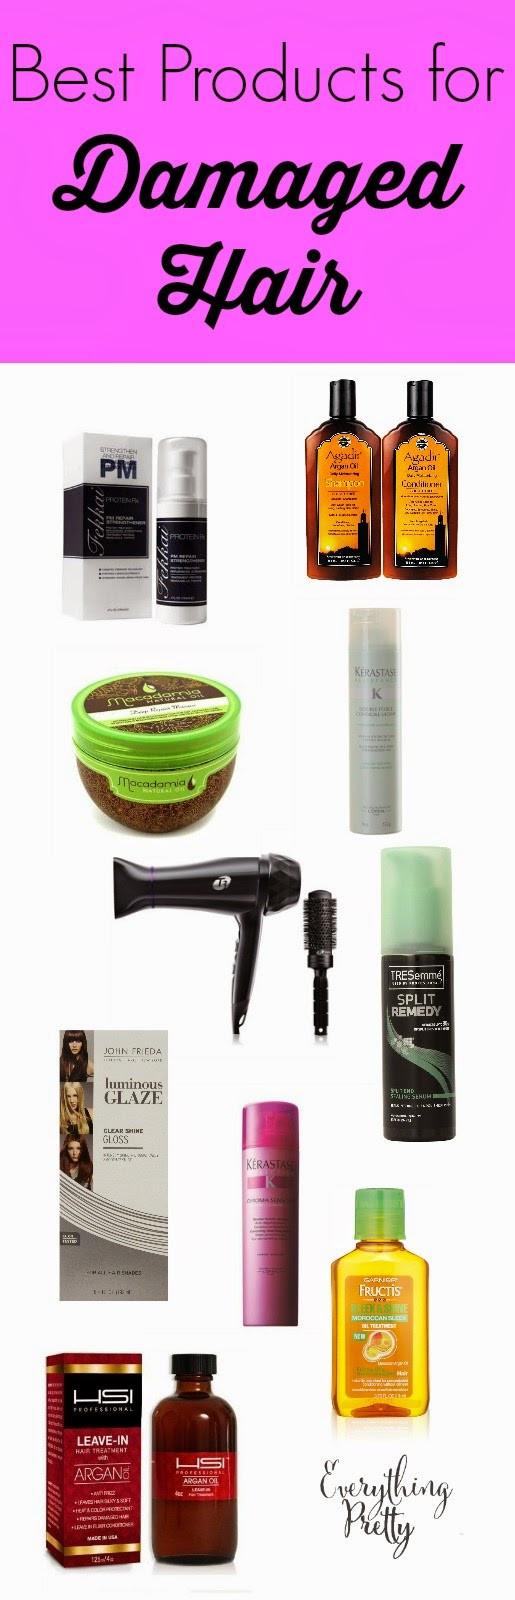 DIY Hot Oil Treatment For Damaged Hair  DIY Avocado Hot Oil Treatment Recipe for Damaged Hair